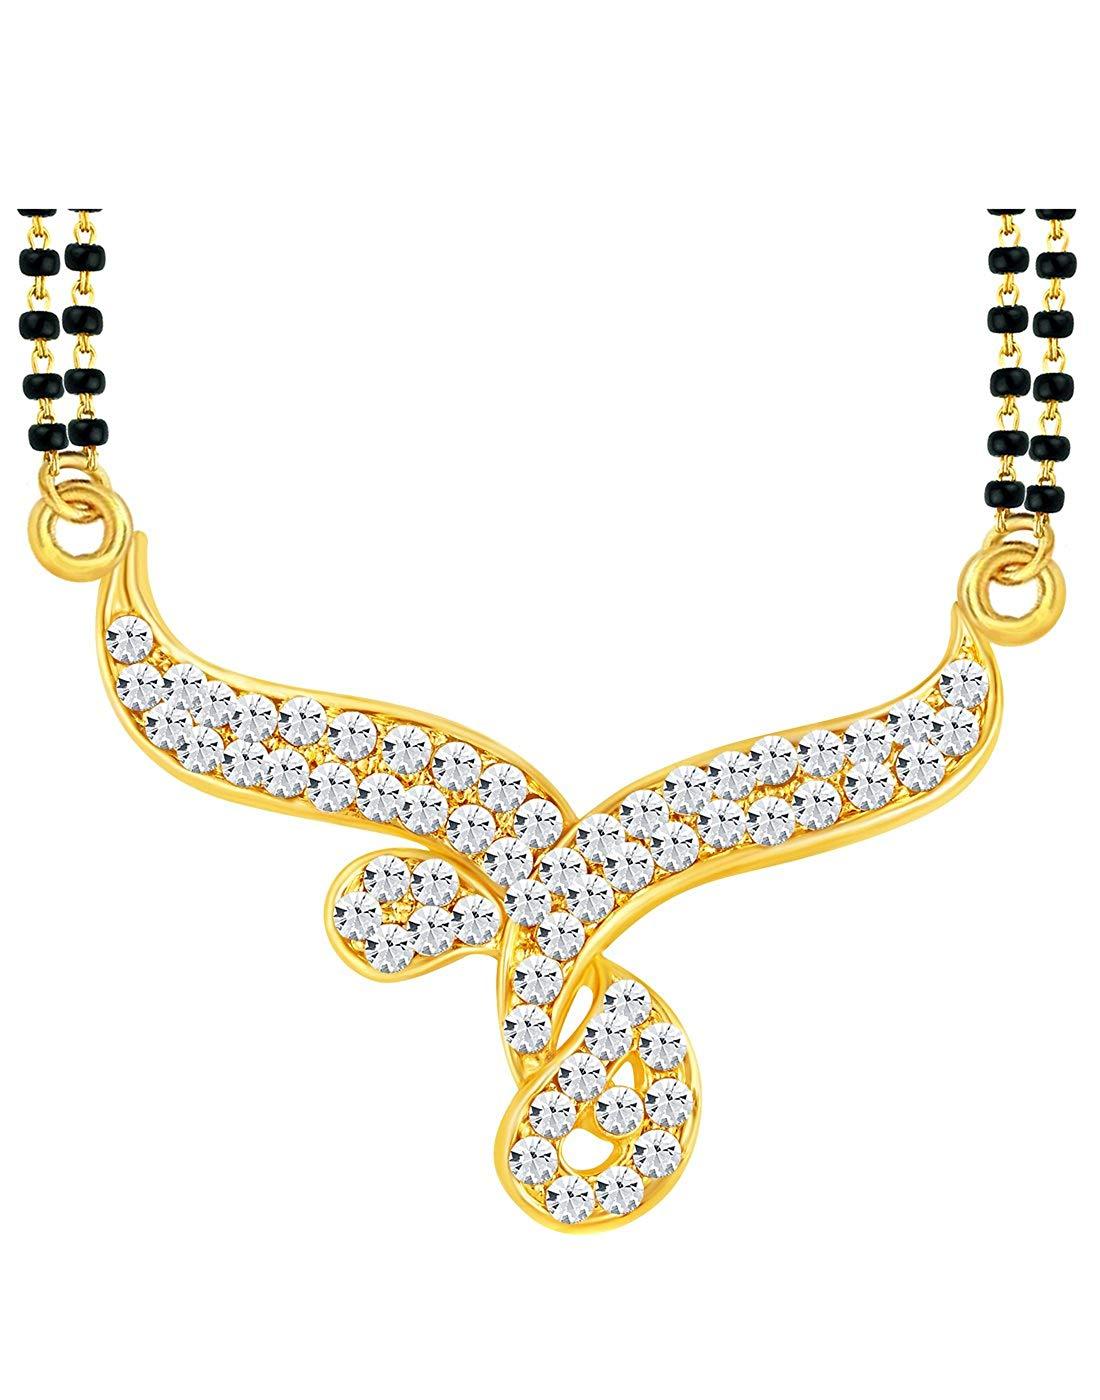 ShoStopper Dazzling Gold Plated Australian Diamond.